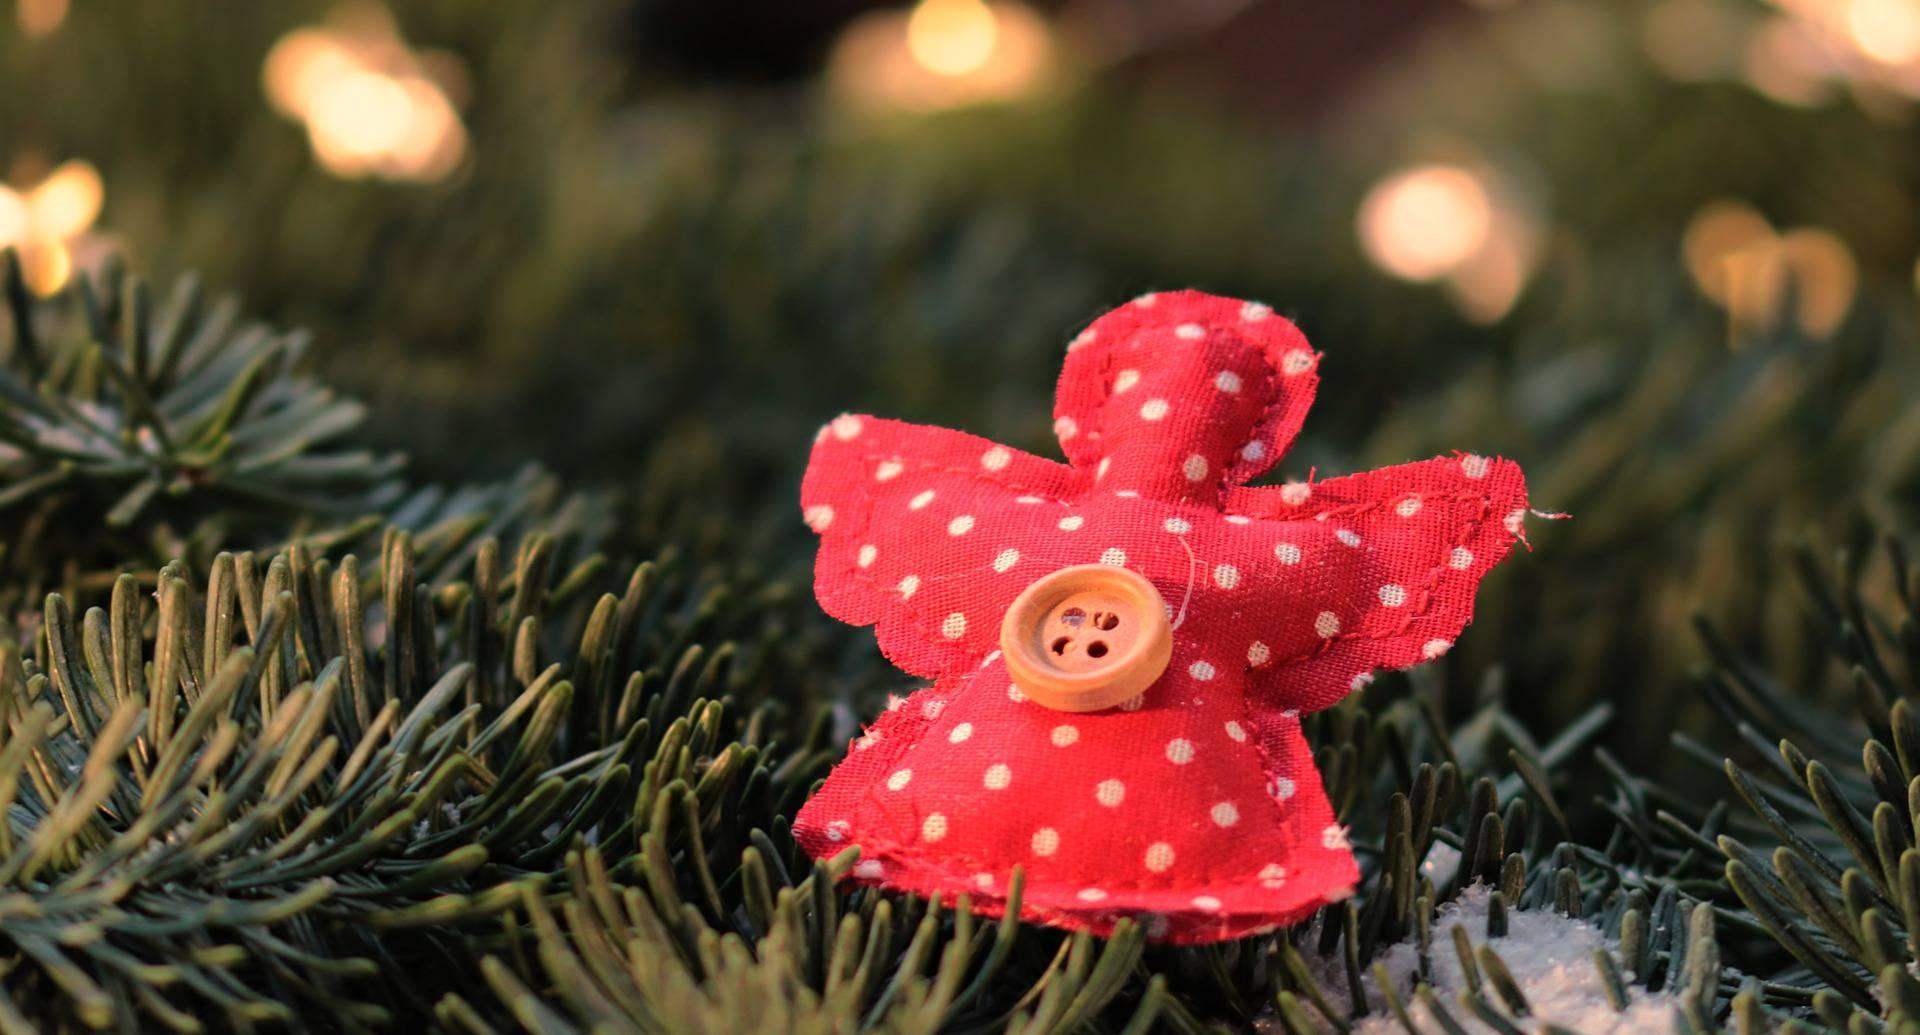 Gli addobbi di Natale fai da te in stoffa